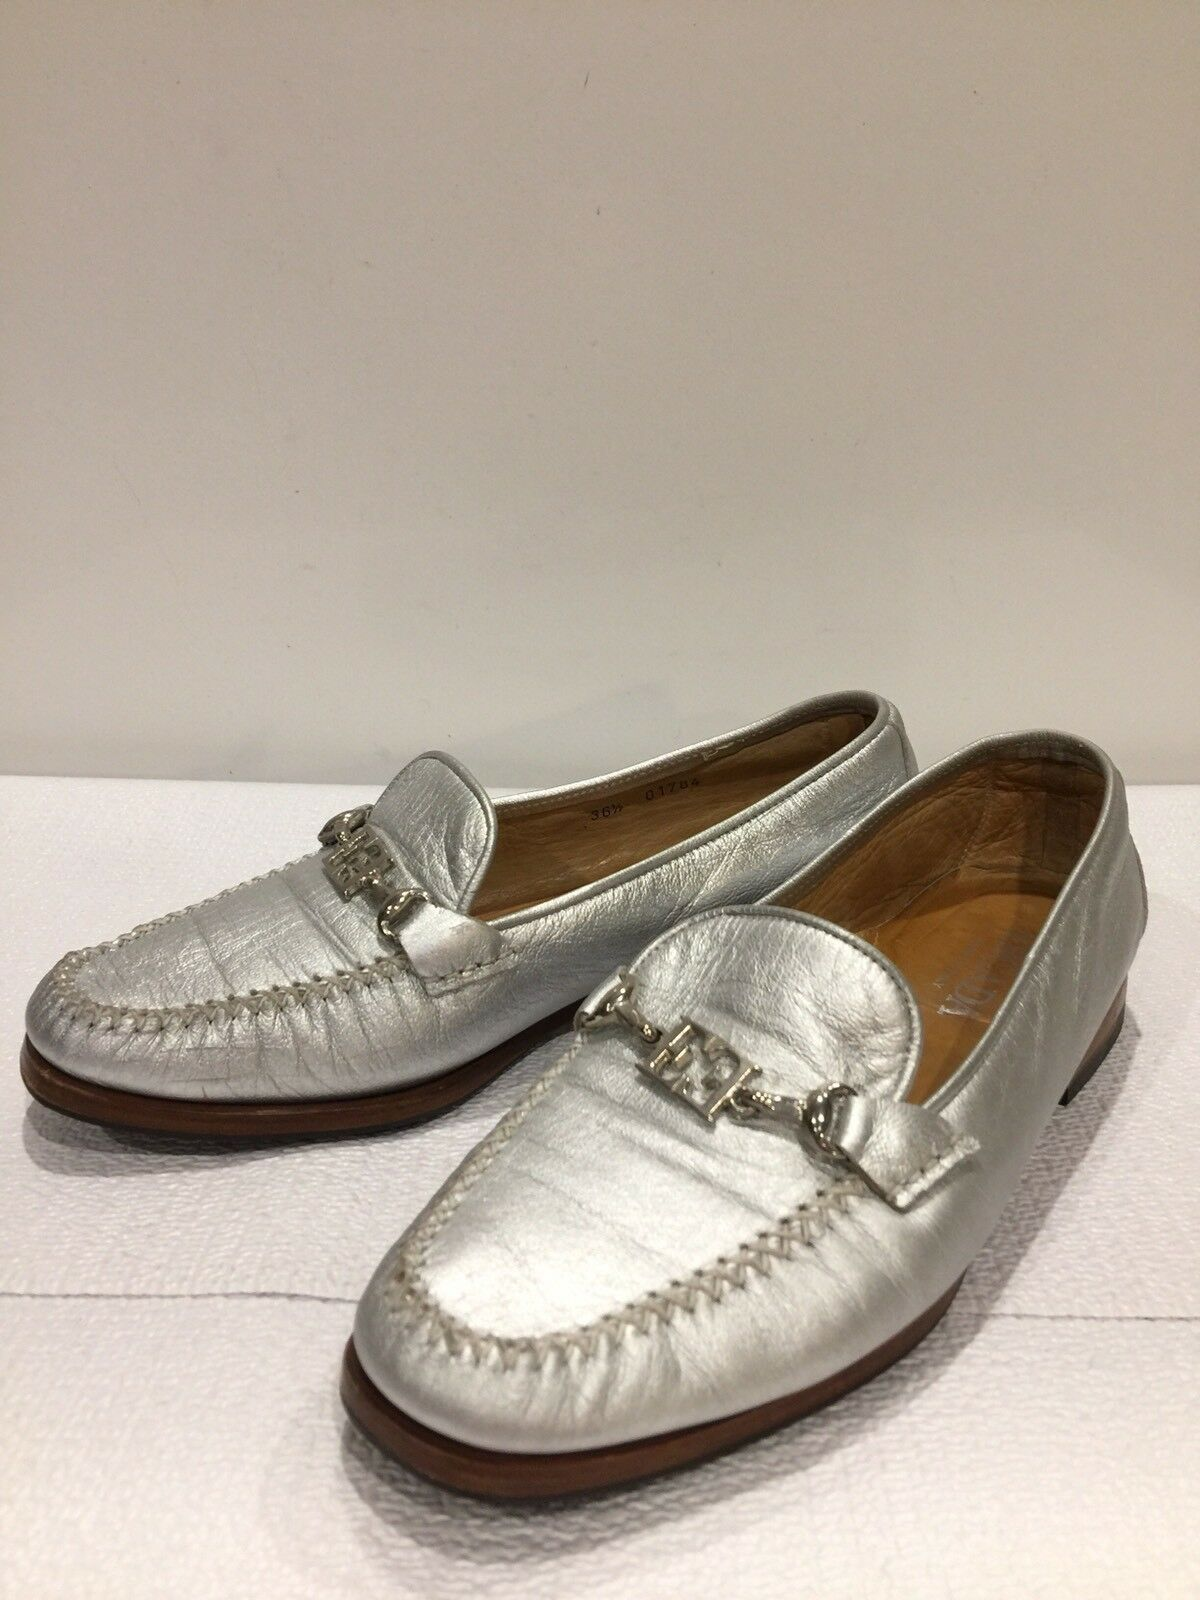 Escada Silver Leder Logo Loafers Schuhes Moccasins, Größe 36.5, 6.5 US